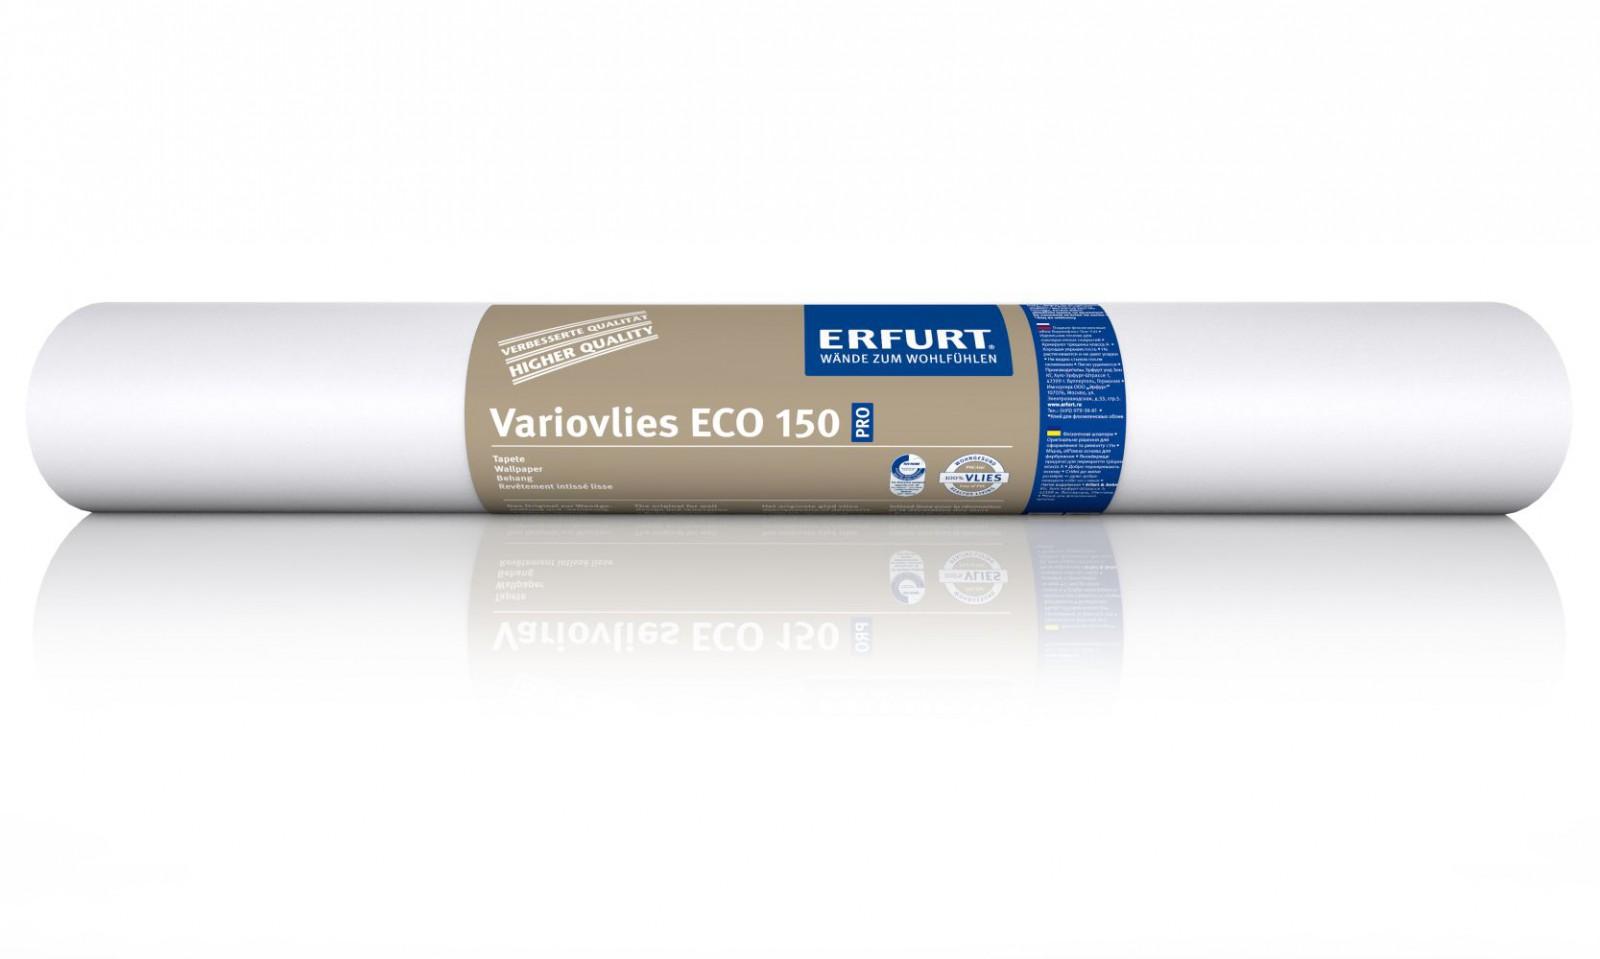 20x lining paper erfurt ecovlies ev 150 wallpaper 375 m. Black Bedroom Furniture Sets. Home Design Ideas